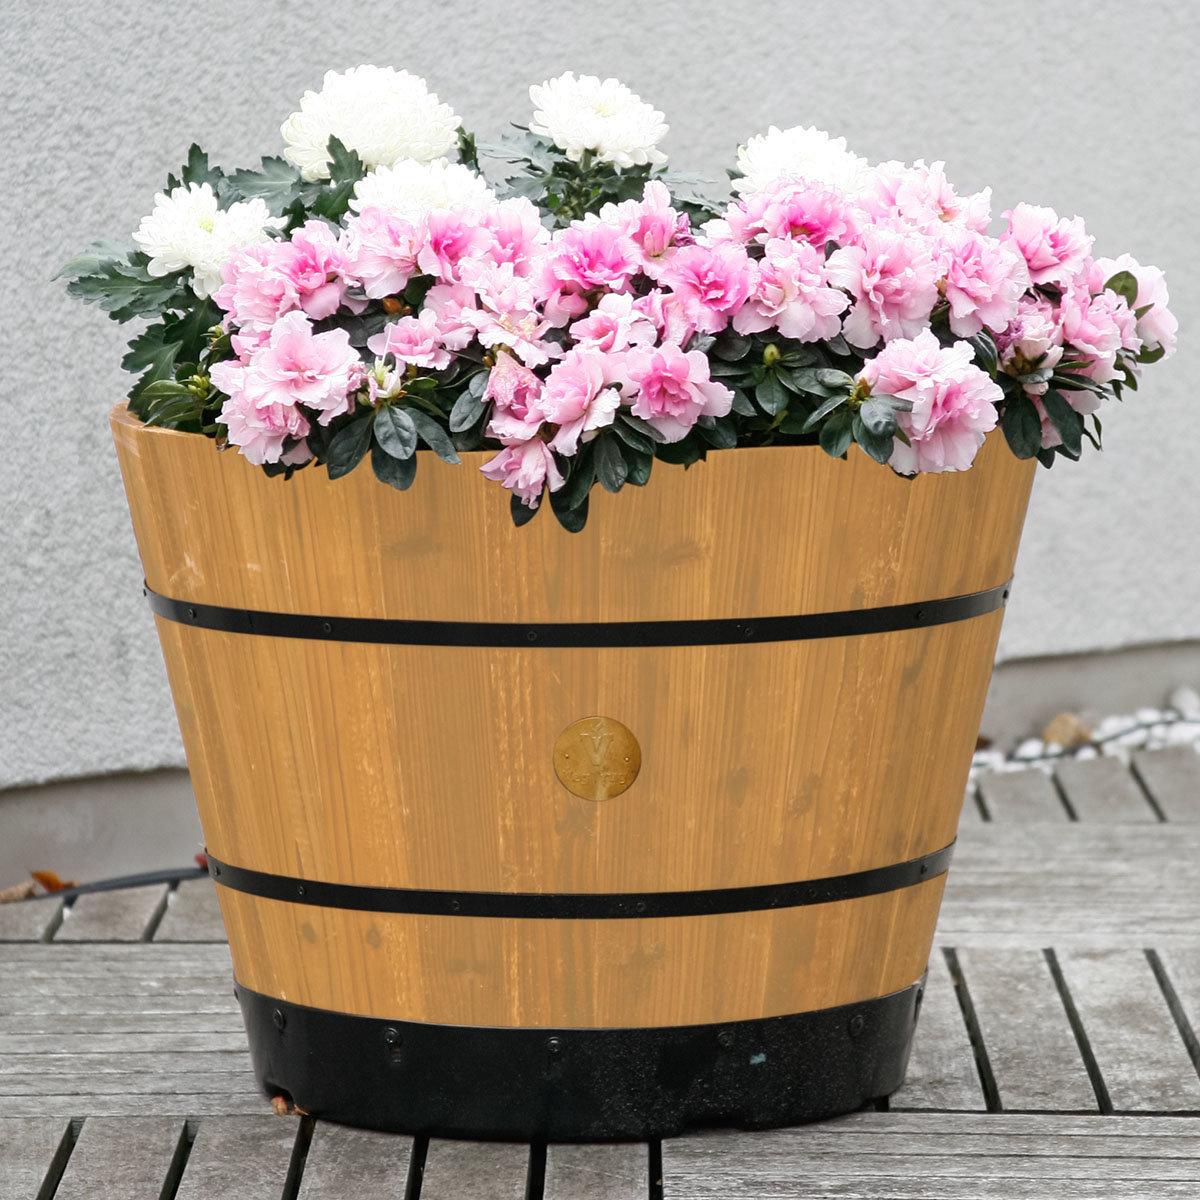 Pflanzfass Brandy, 41x55x55 cm, natur